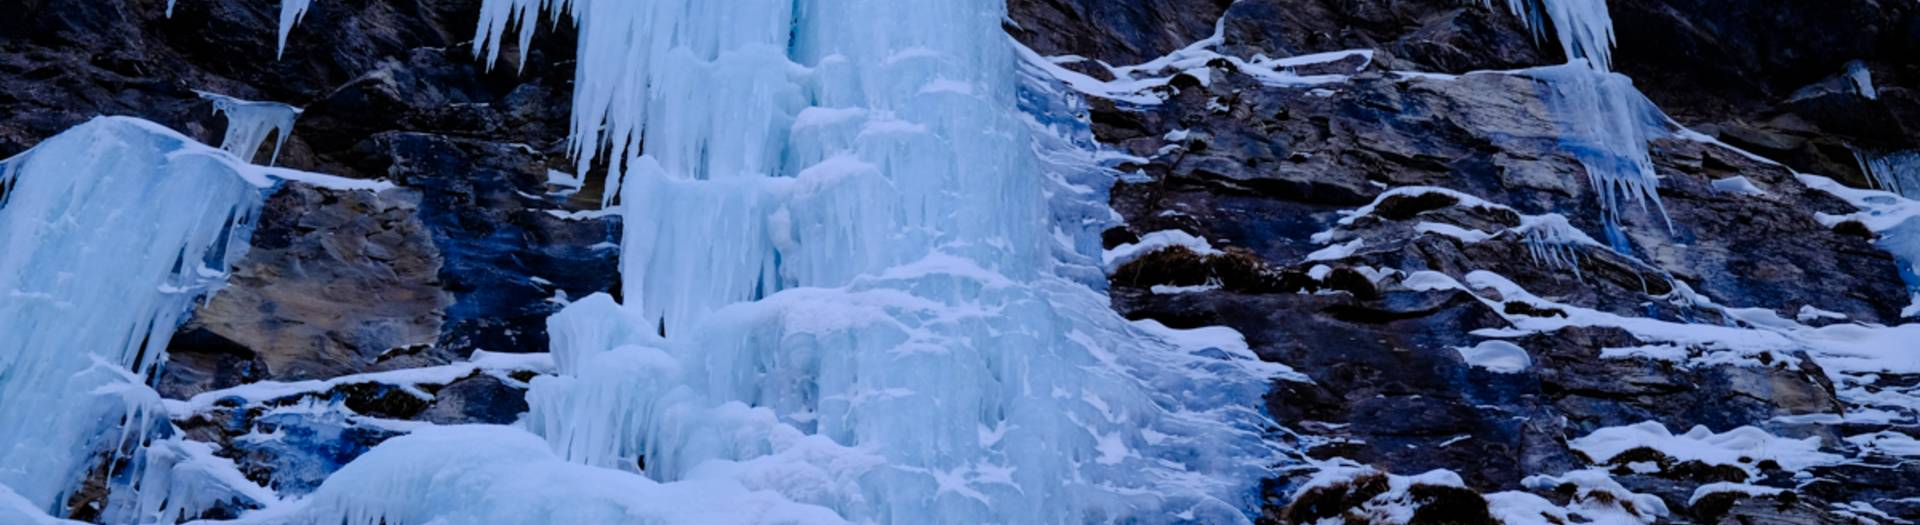 Eisfaelle im Fleisstal